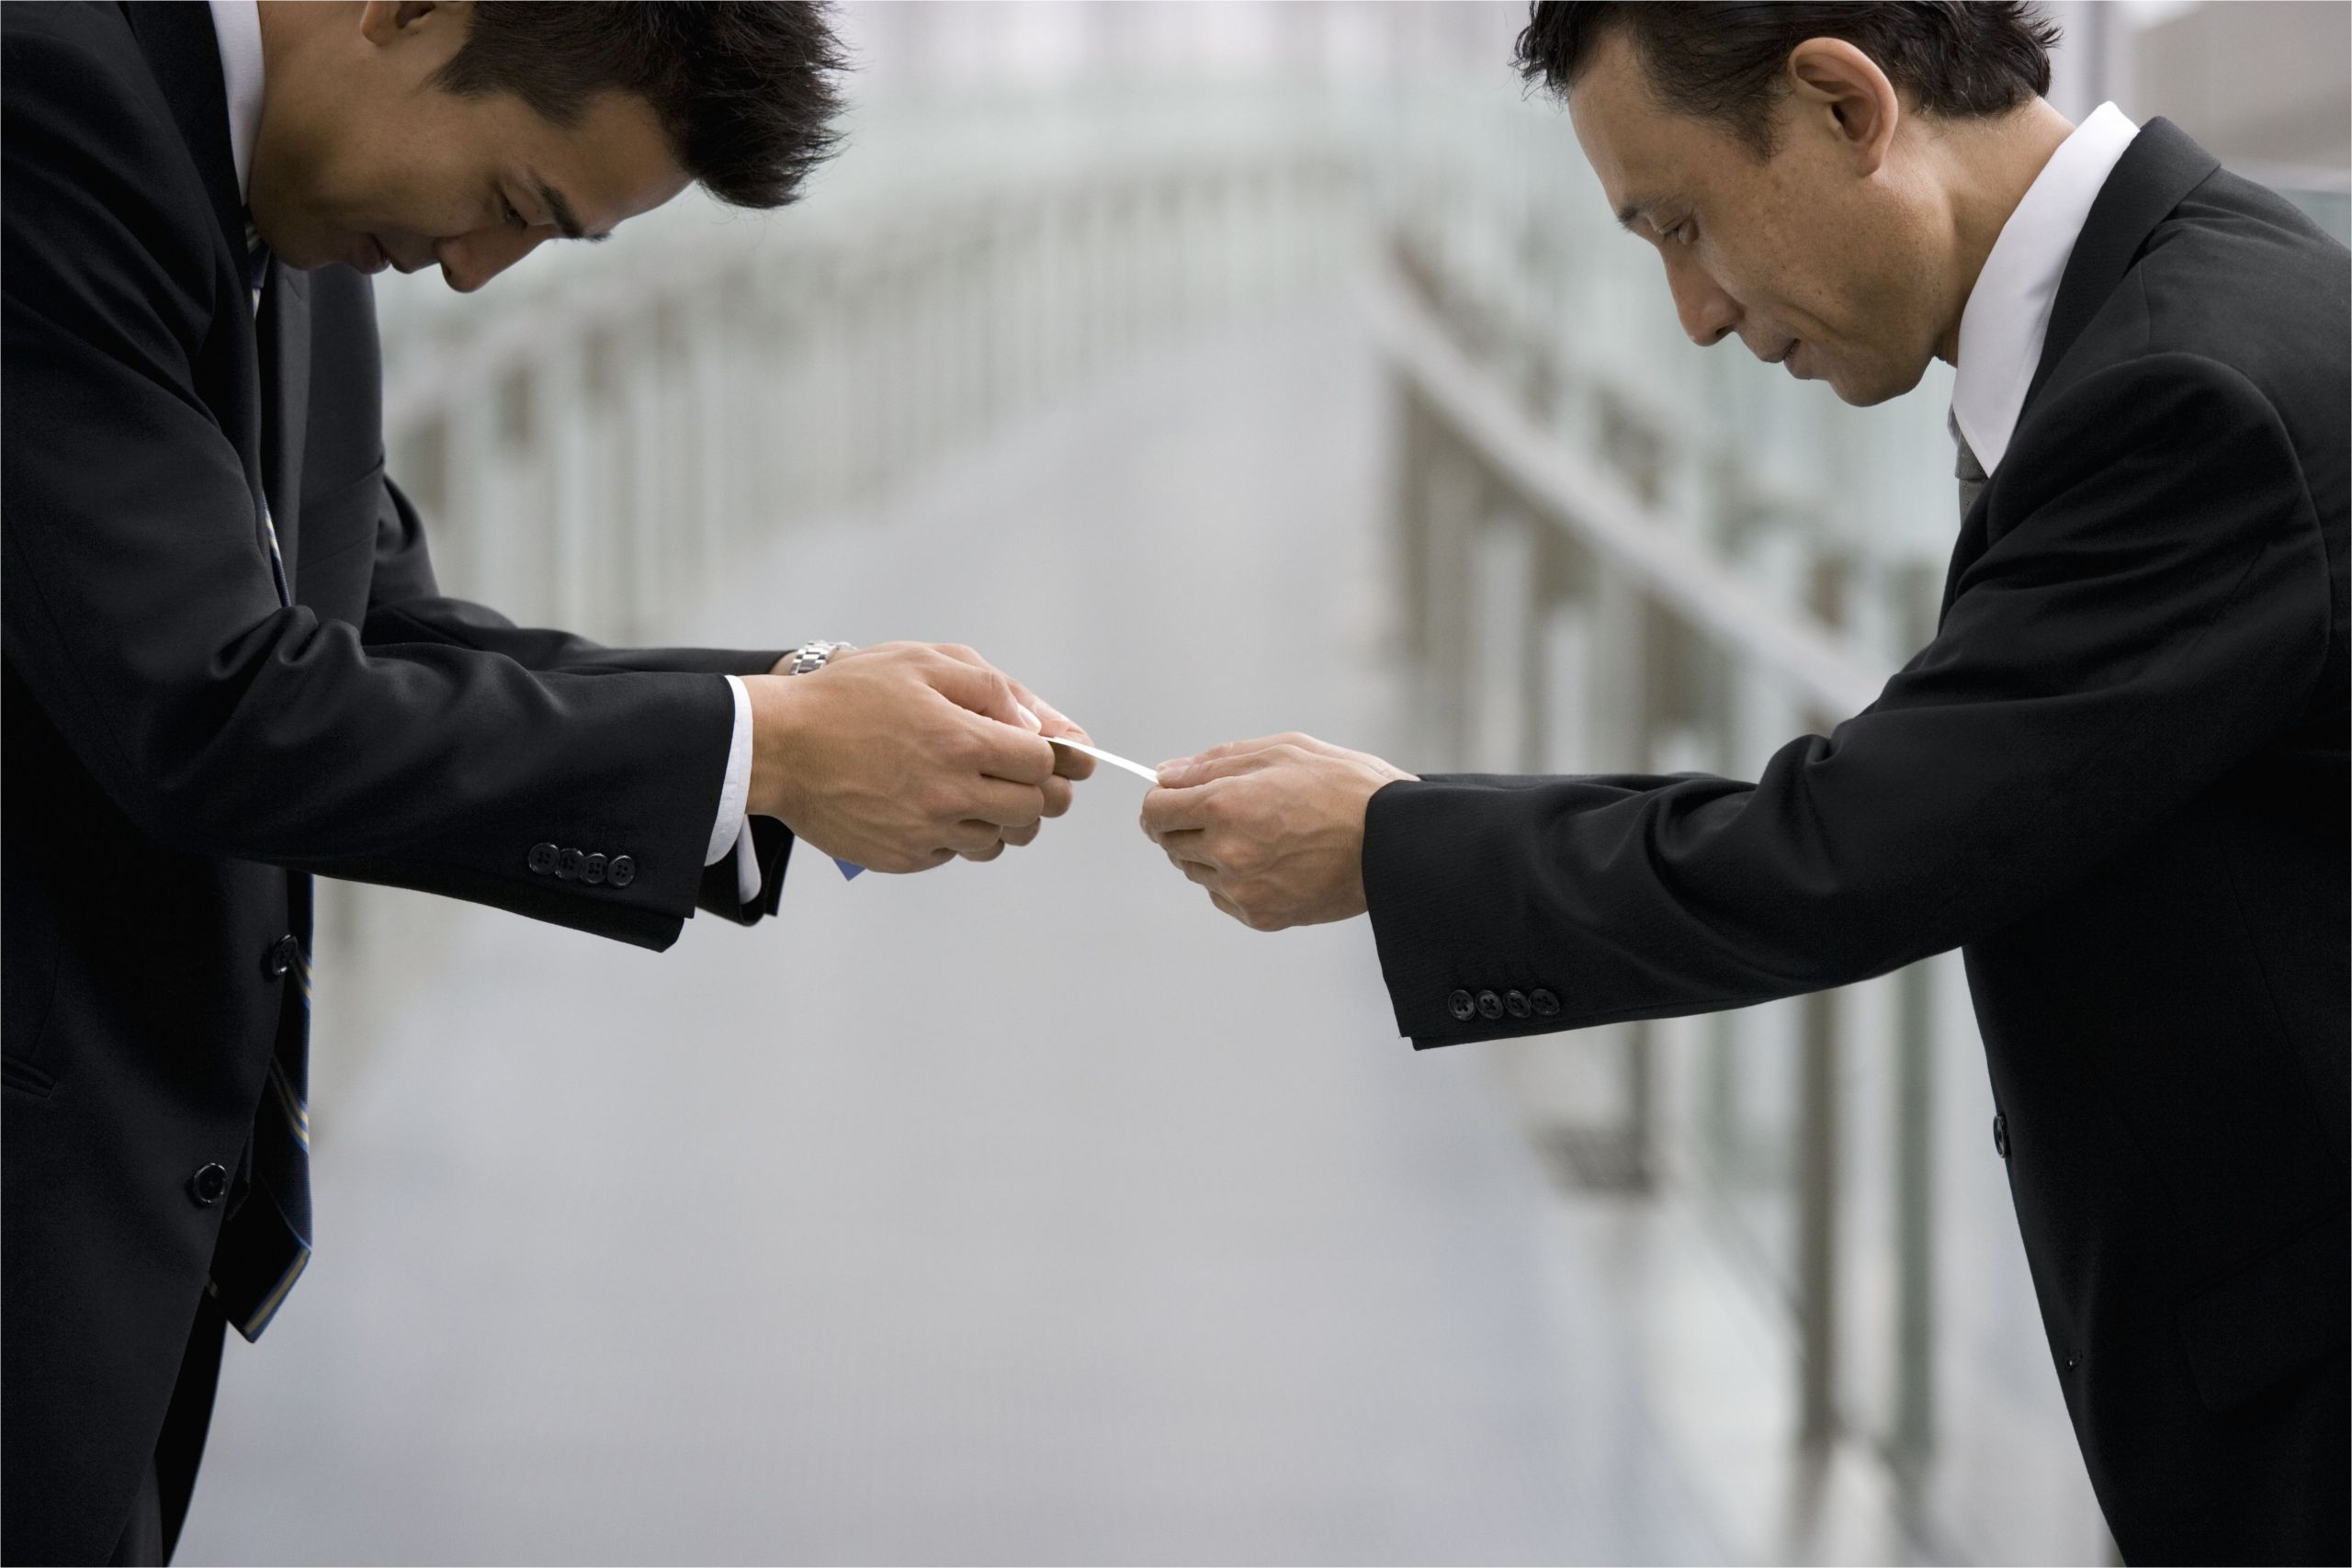 japanese businessmen exchanging business cards 78767477 5c2cd670c9e77c00017e55a9 jpg